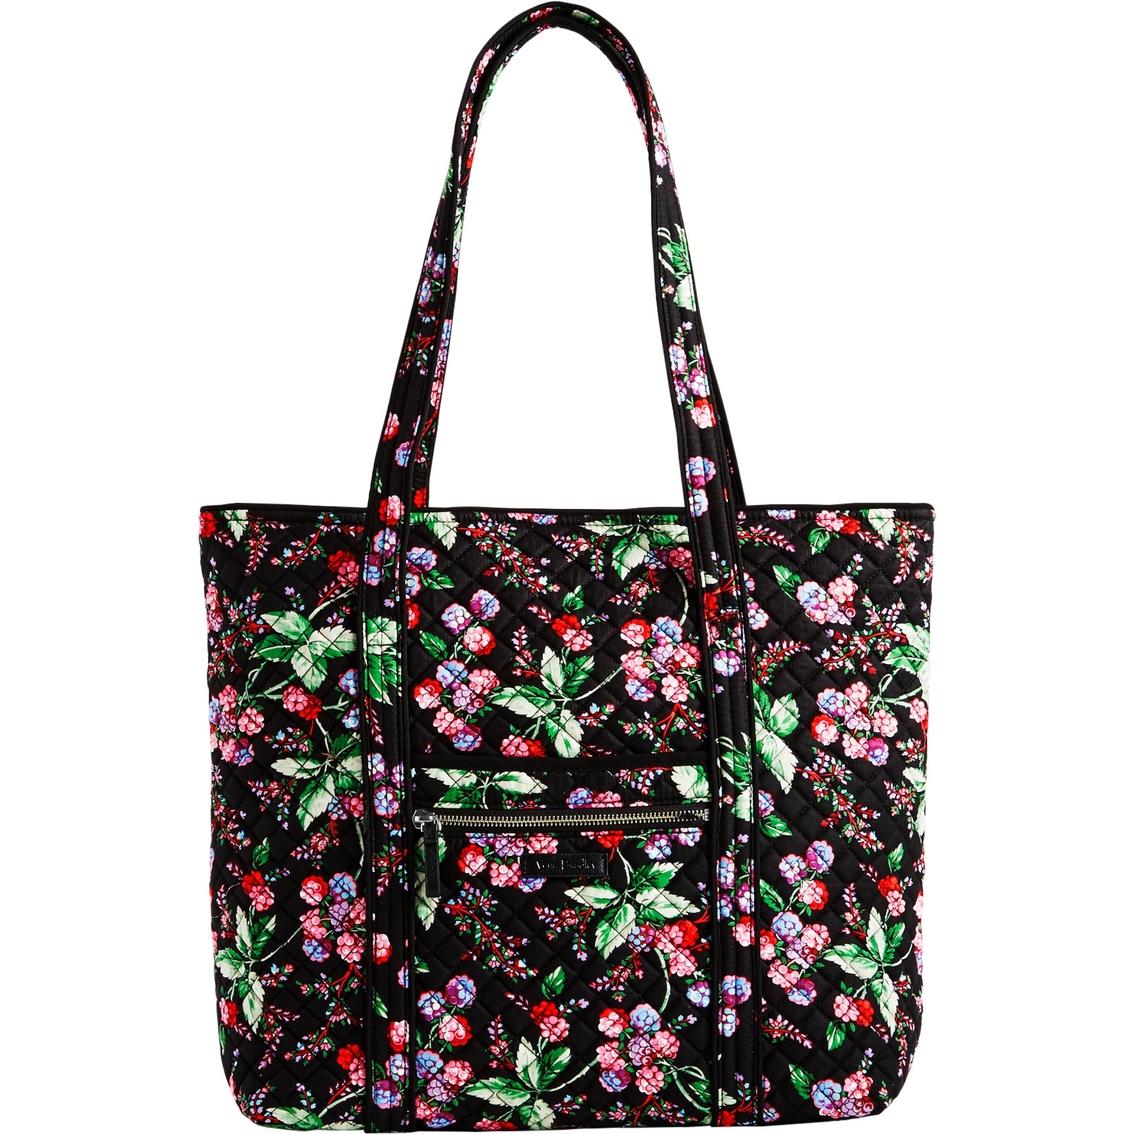 Vera Bradley Iconic Vera Tote-Vera Bradley Bags